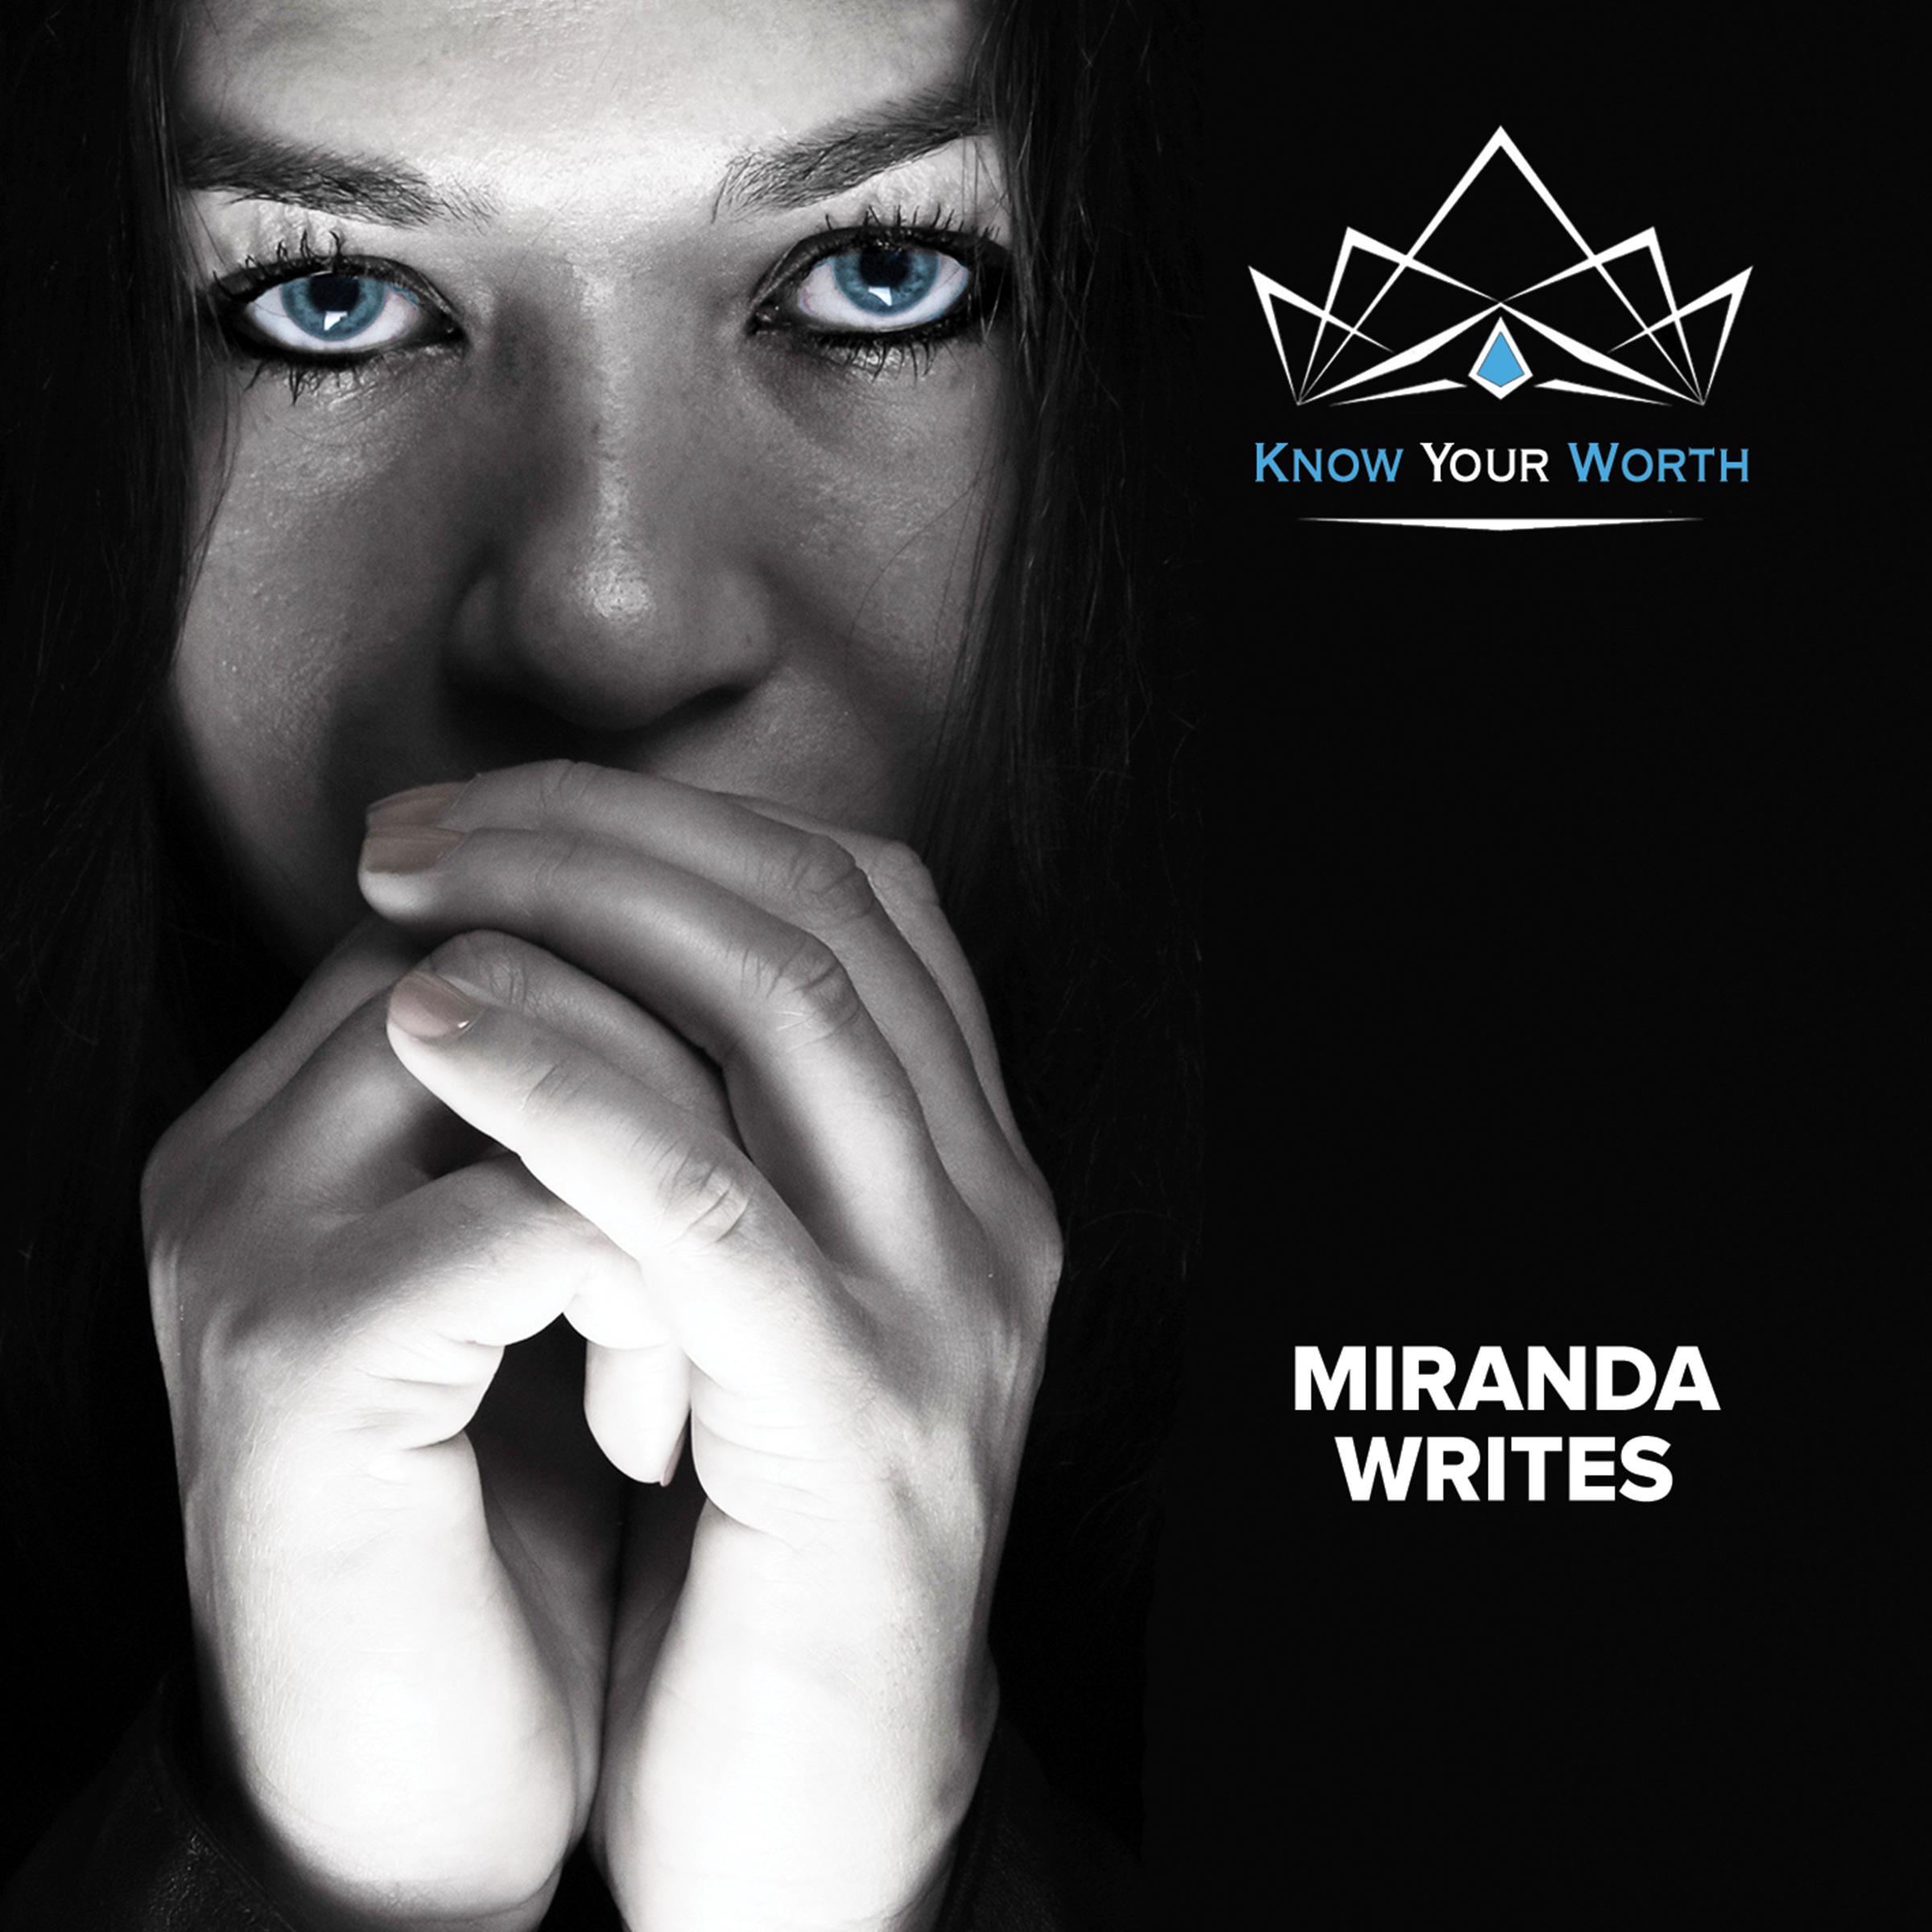 MIRANDA WRITES COVER